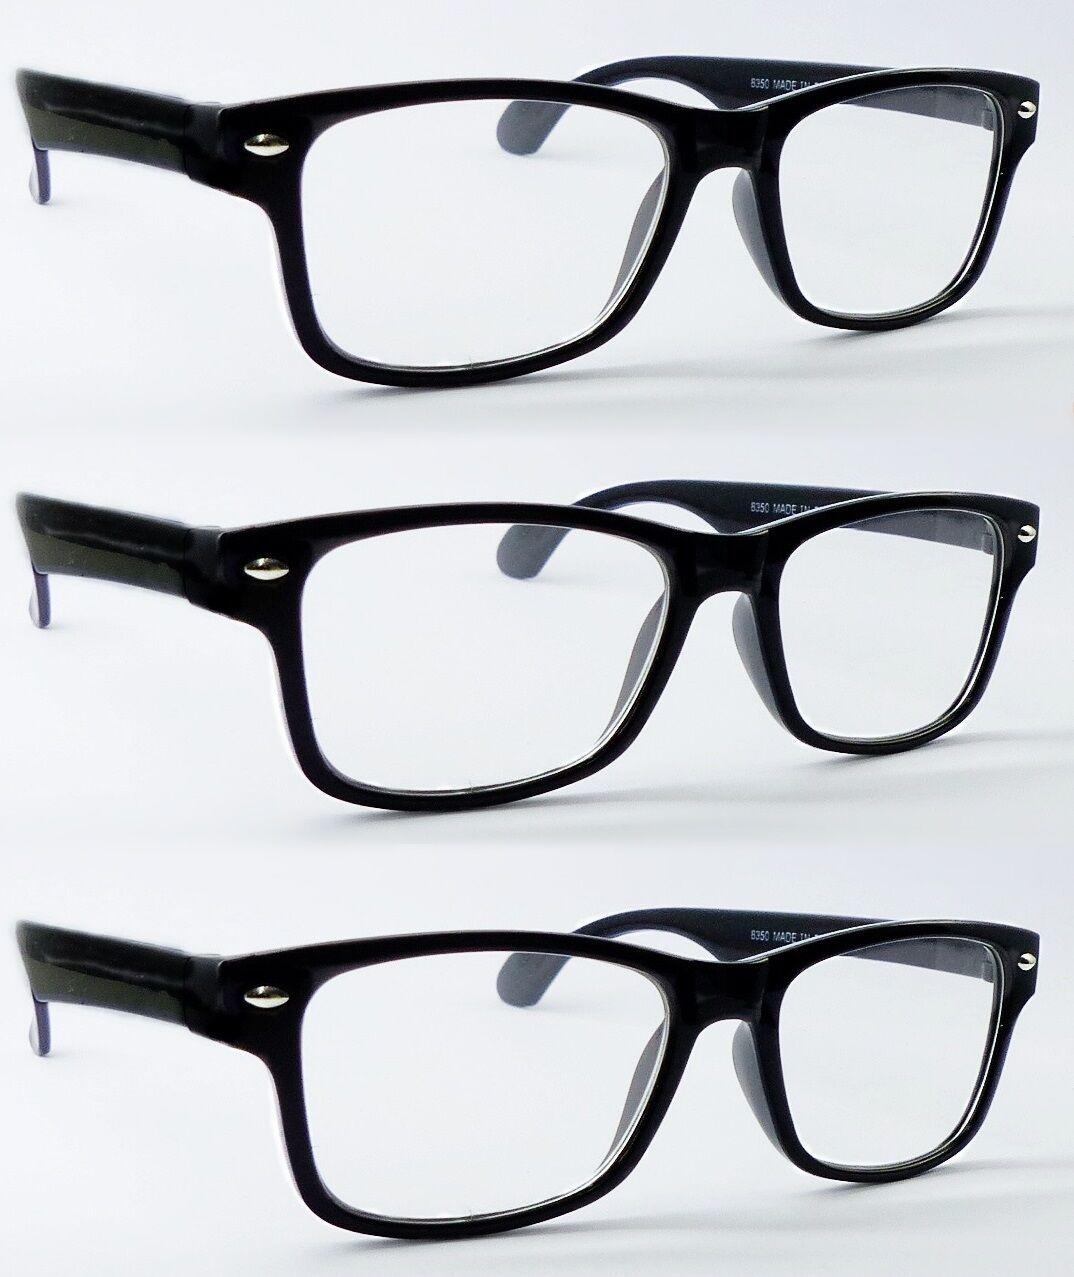 Lesebrille Nerd-Brille Lesehilfe Sehhilfe DPT: +1,00 +1,50 +2,00+2,50 3,5 M8350